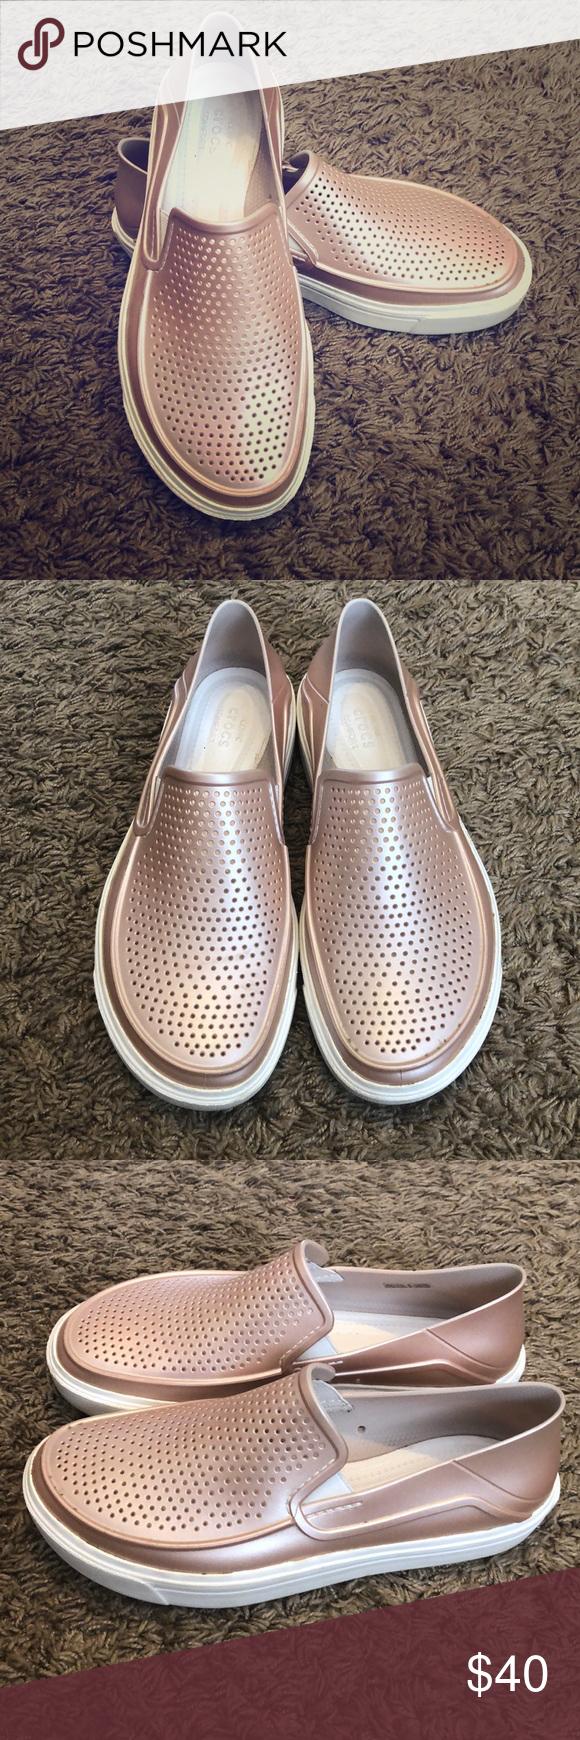 0605bd310ad7 Women s CitiLane Roka Metallic Slip-Ons Beautiful and comfortable rose-gold  metallic vintage-inspired sneakers. CROCS Shoes Sneakers